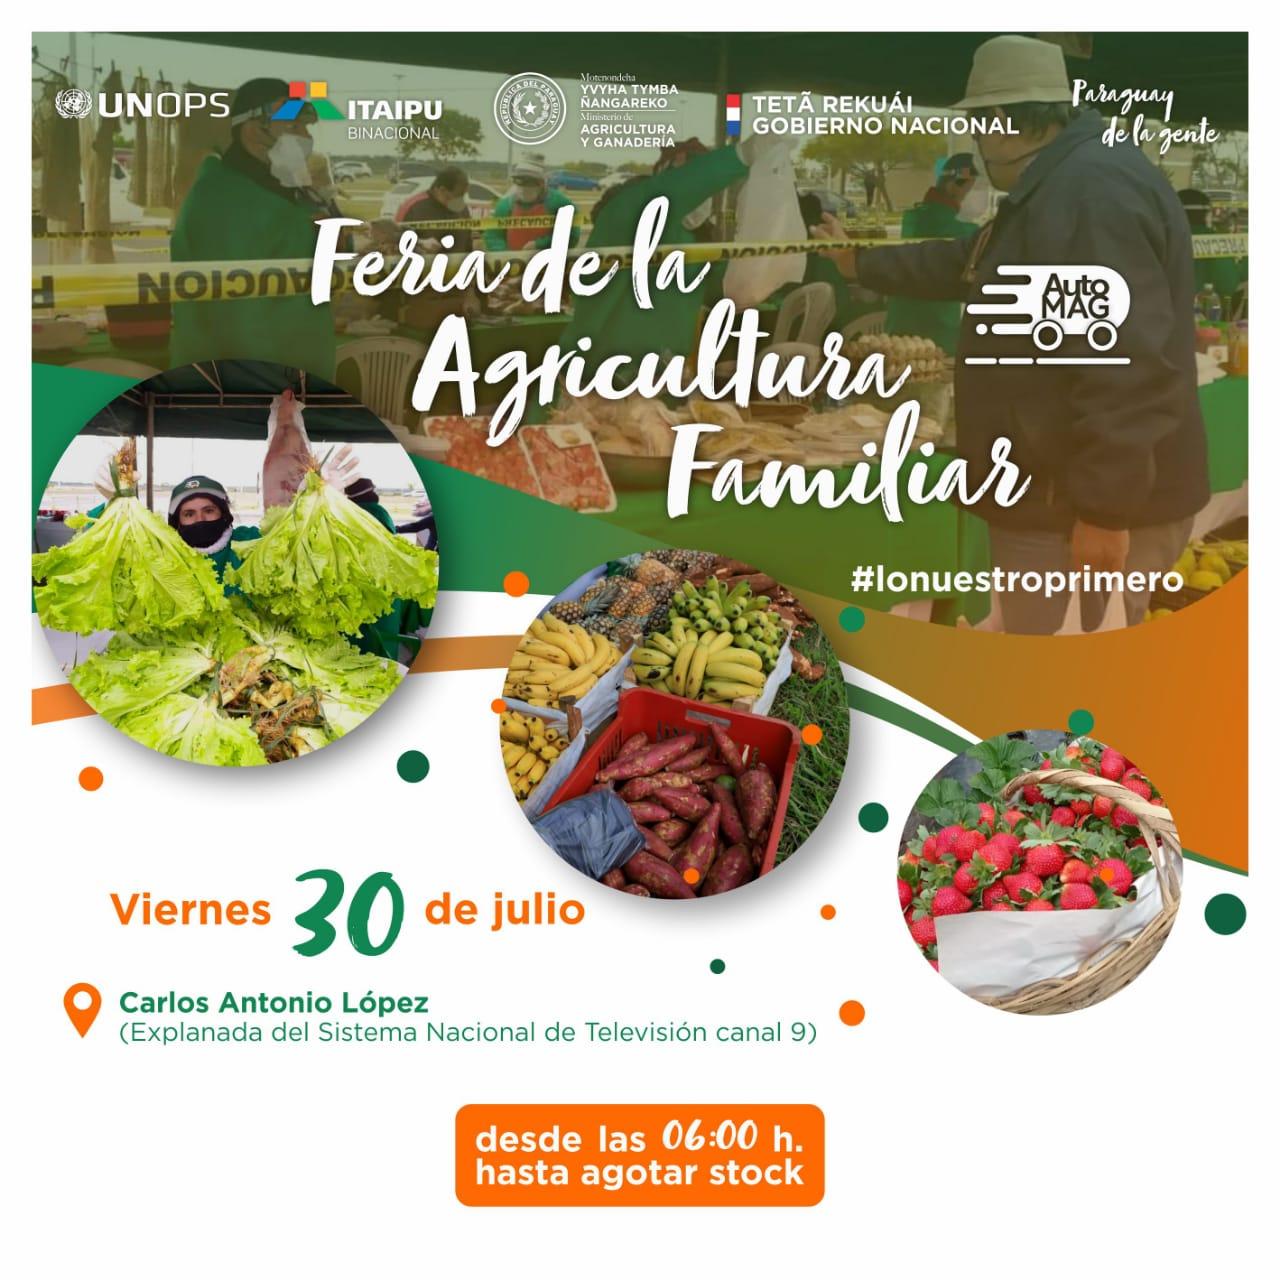 AgriculturaFamiliar_2021-07-30